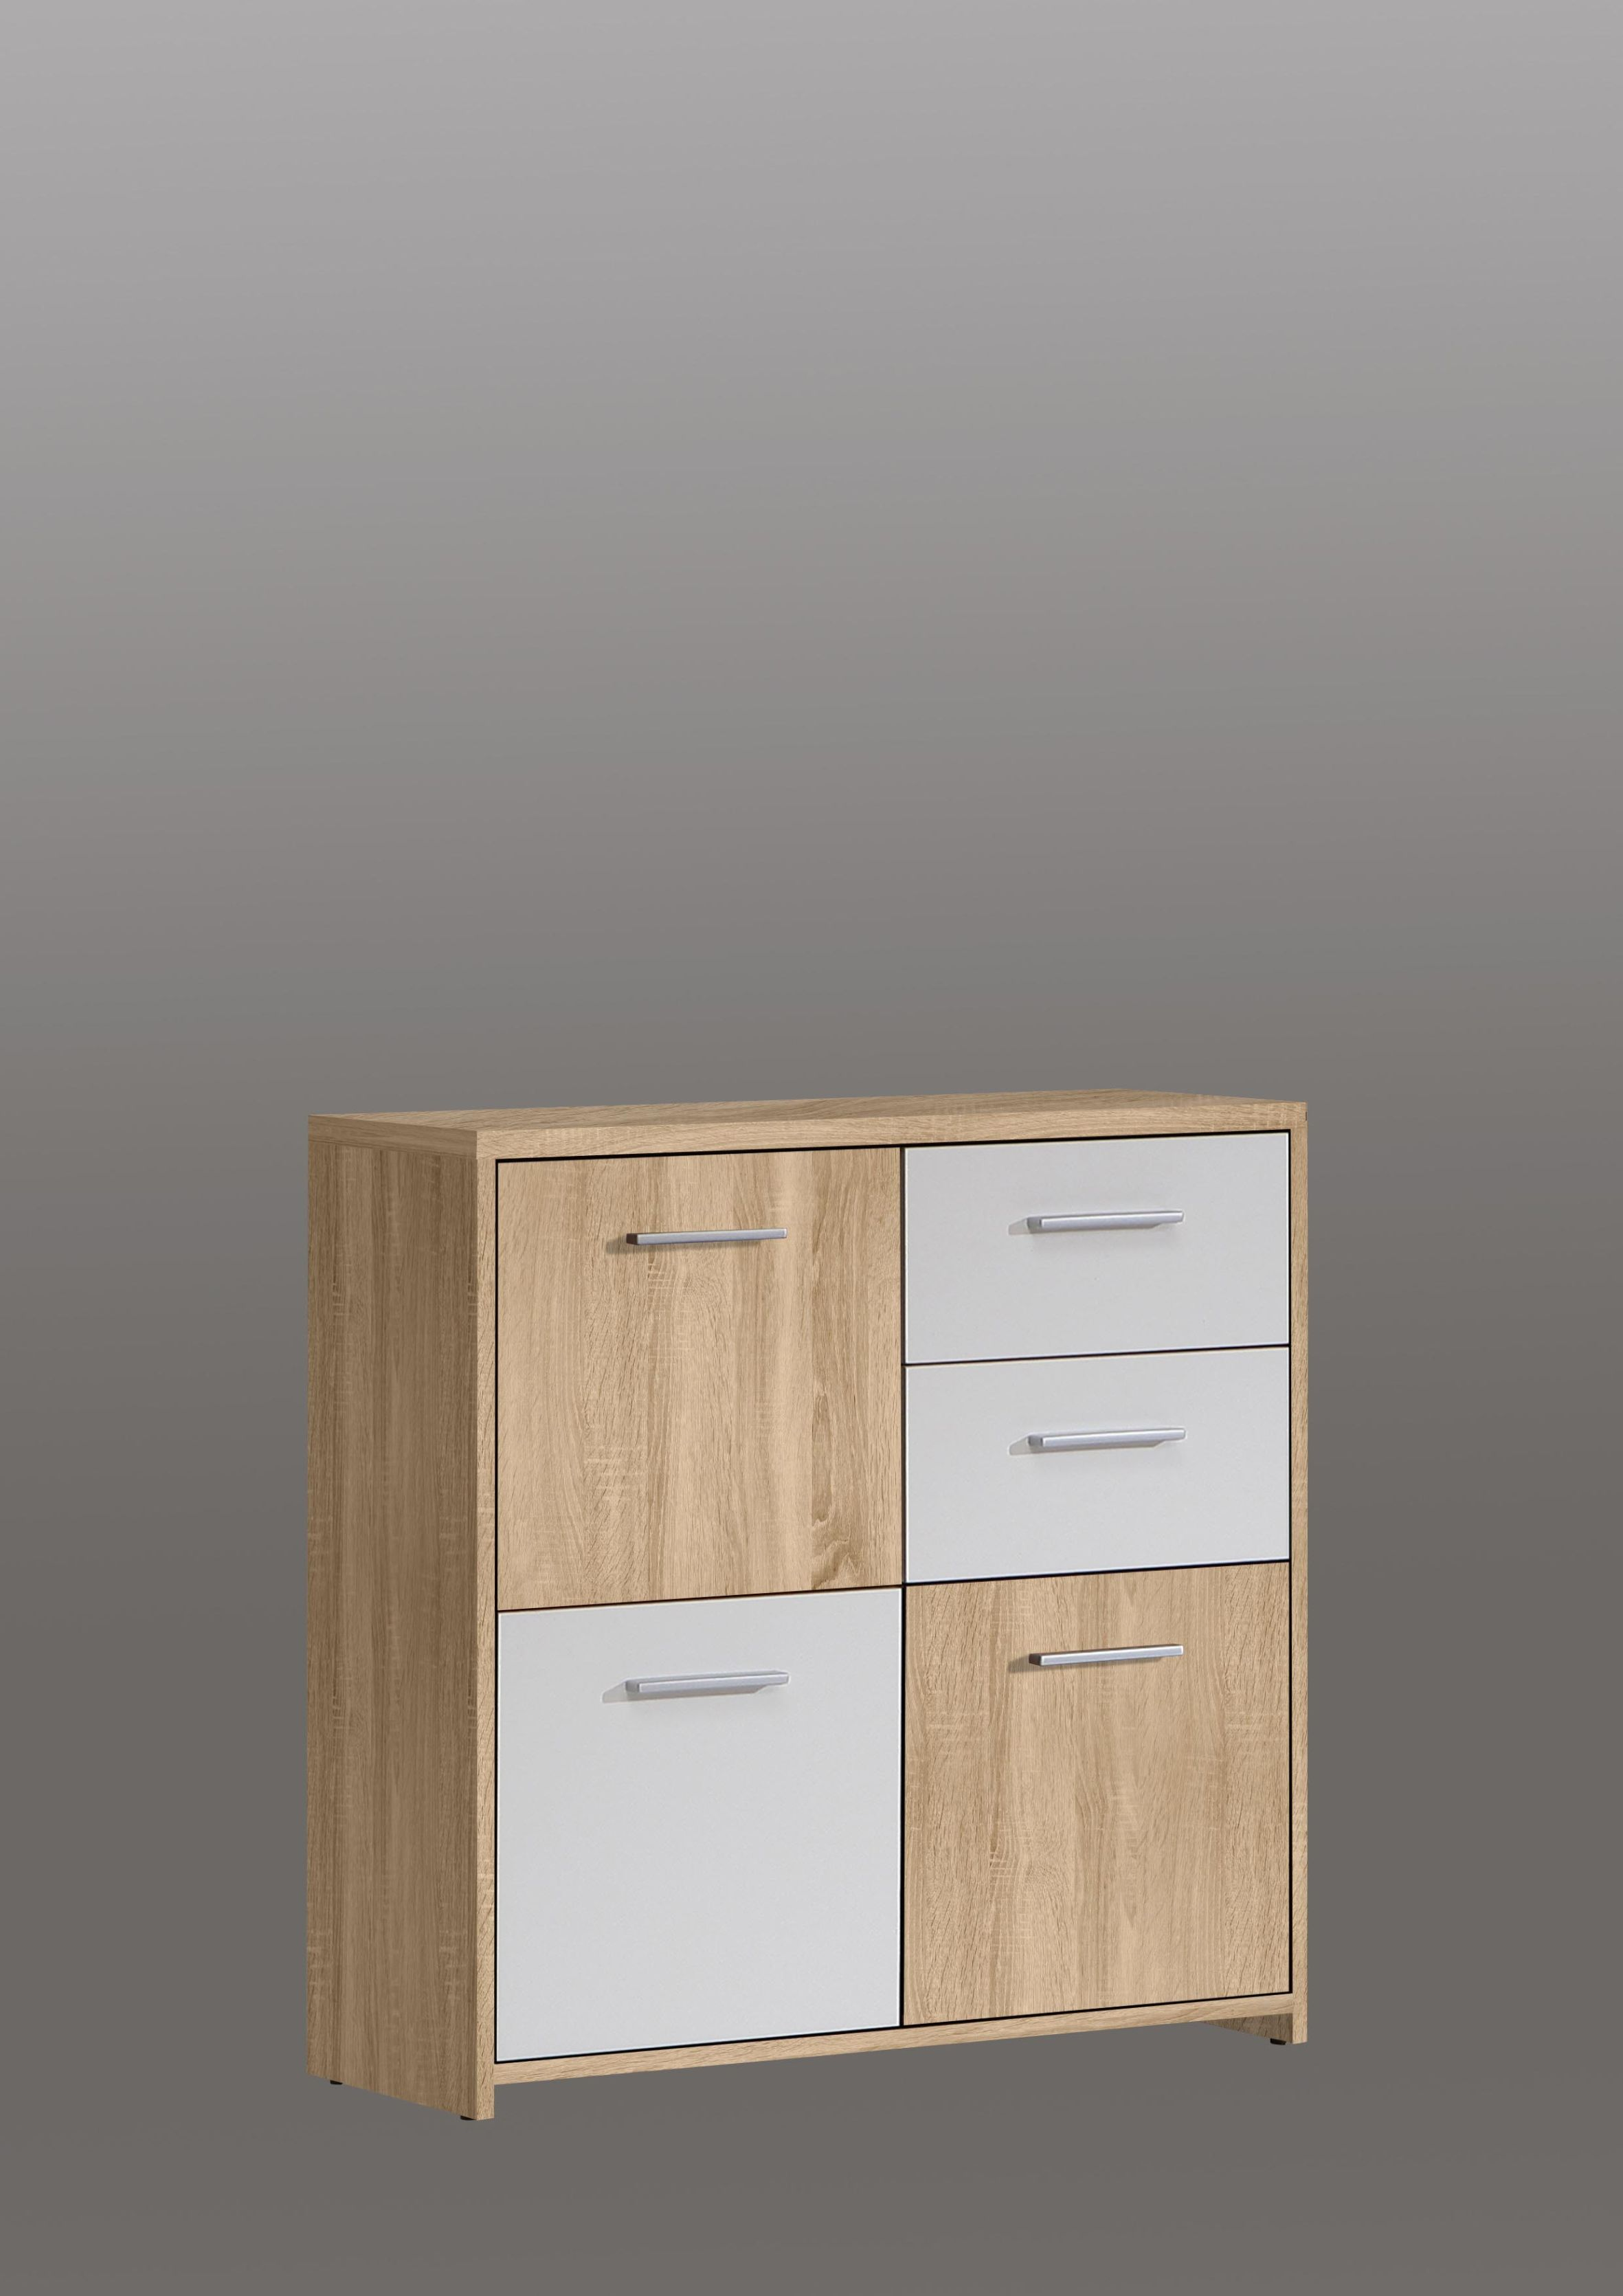 quadro kommode f r esszimmer wohnzimmer. Black Bedroom Furniture Sets. Home Design Ideas